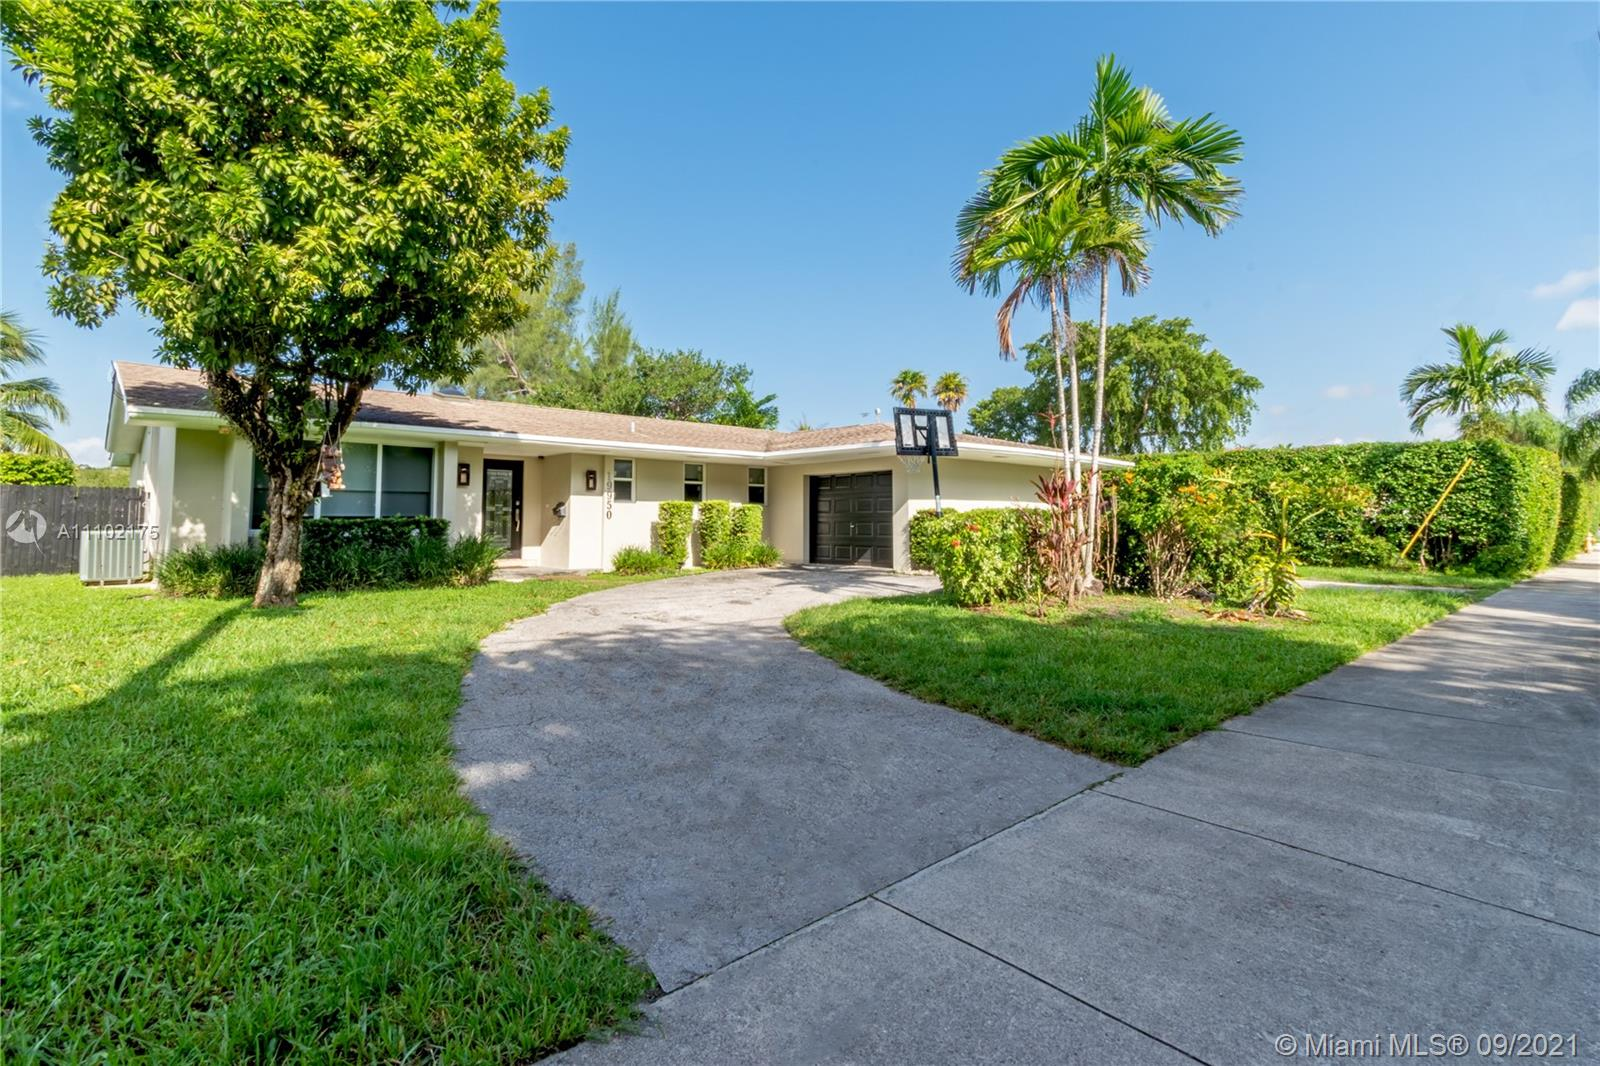 Single Family Home,For Rent,19950 NE 24th Ave #19950, Aventura, Florida 33180,Brickell,realty,broker,condos near me